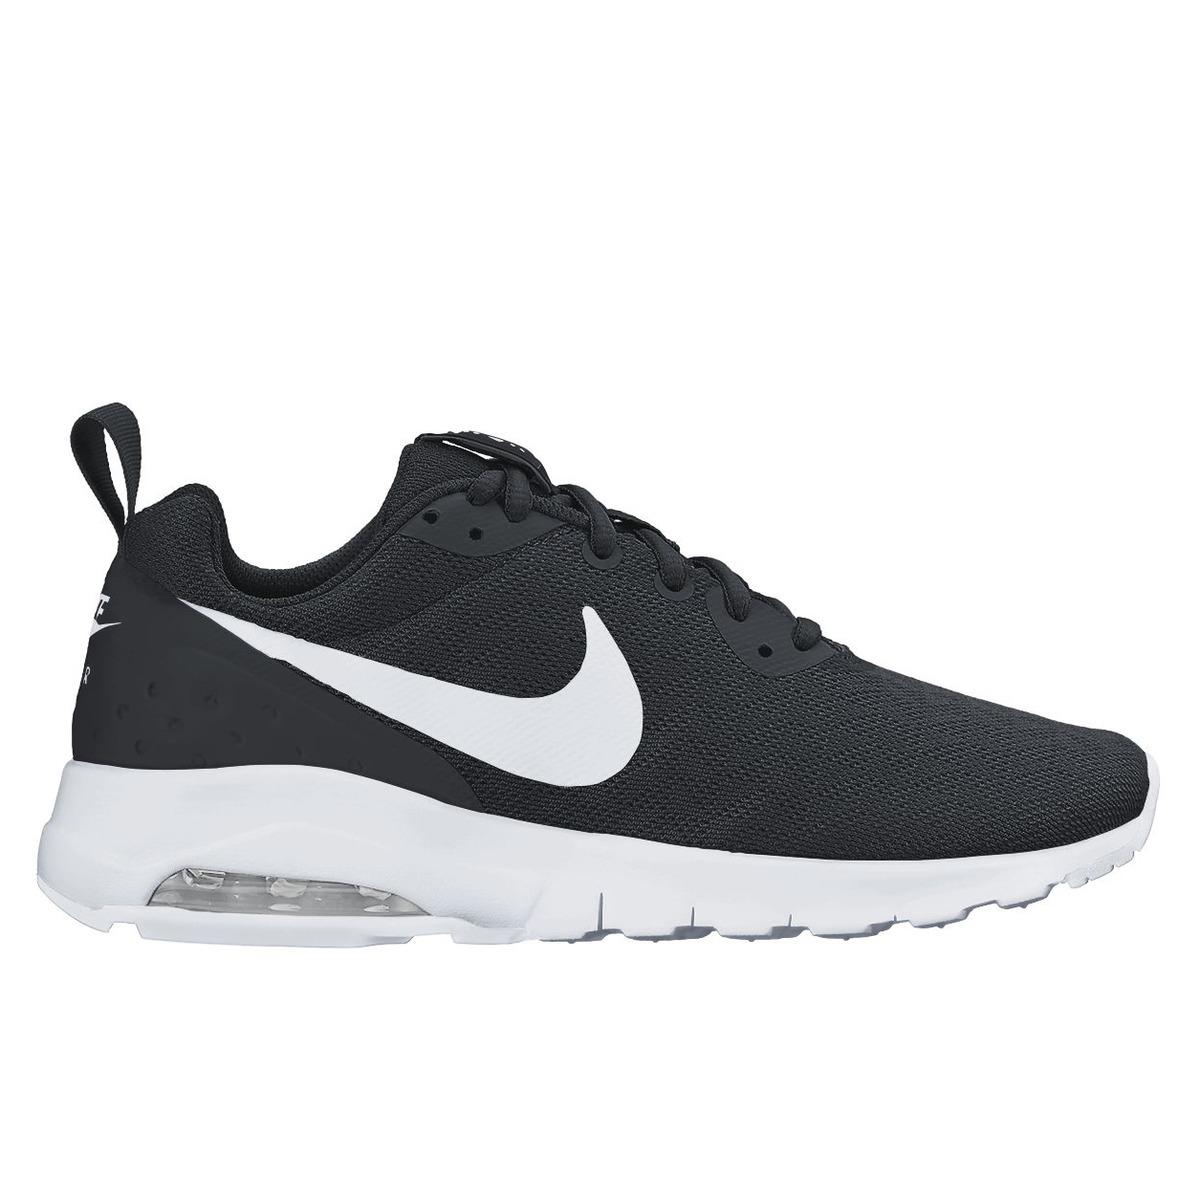 4978373aeec9be Nike Am 16 Ul